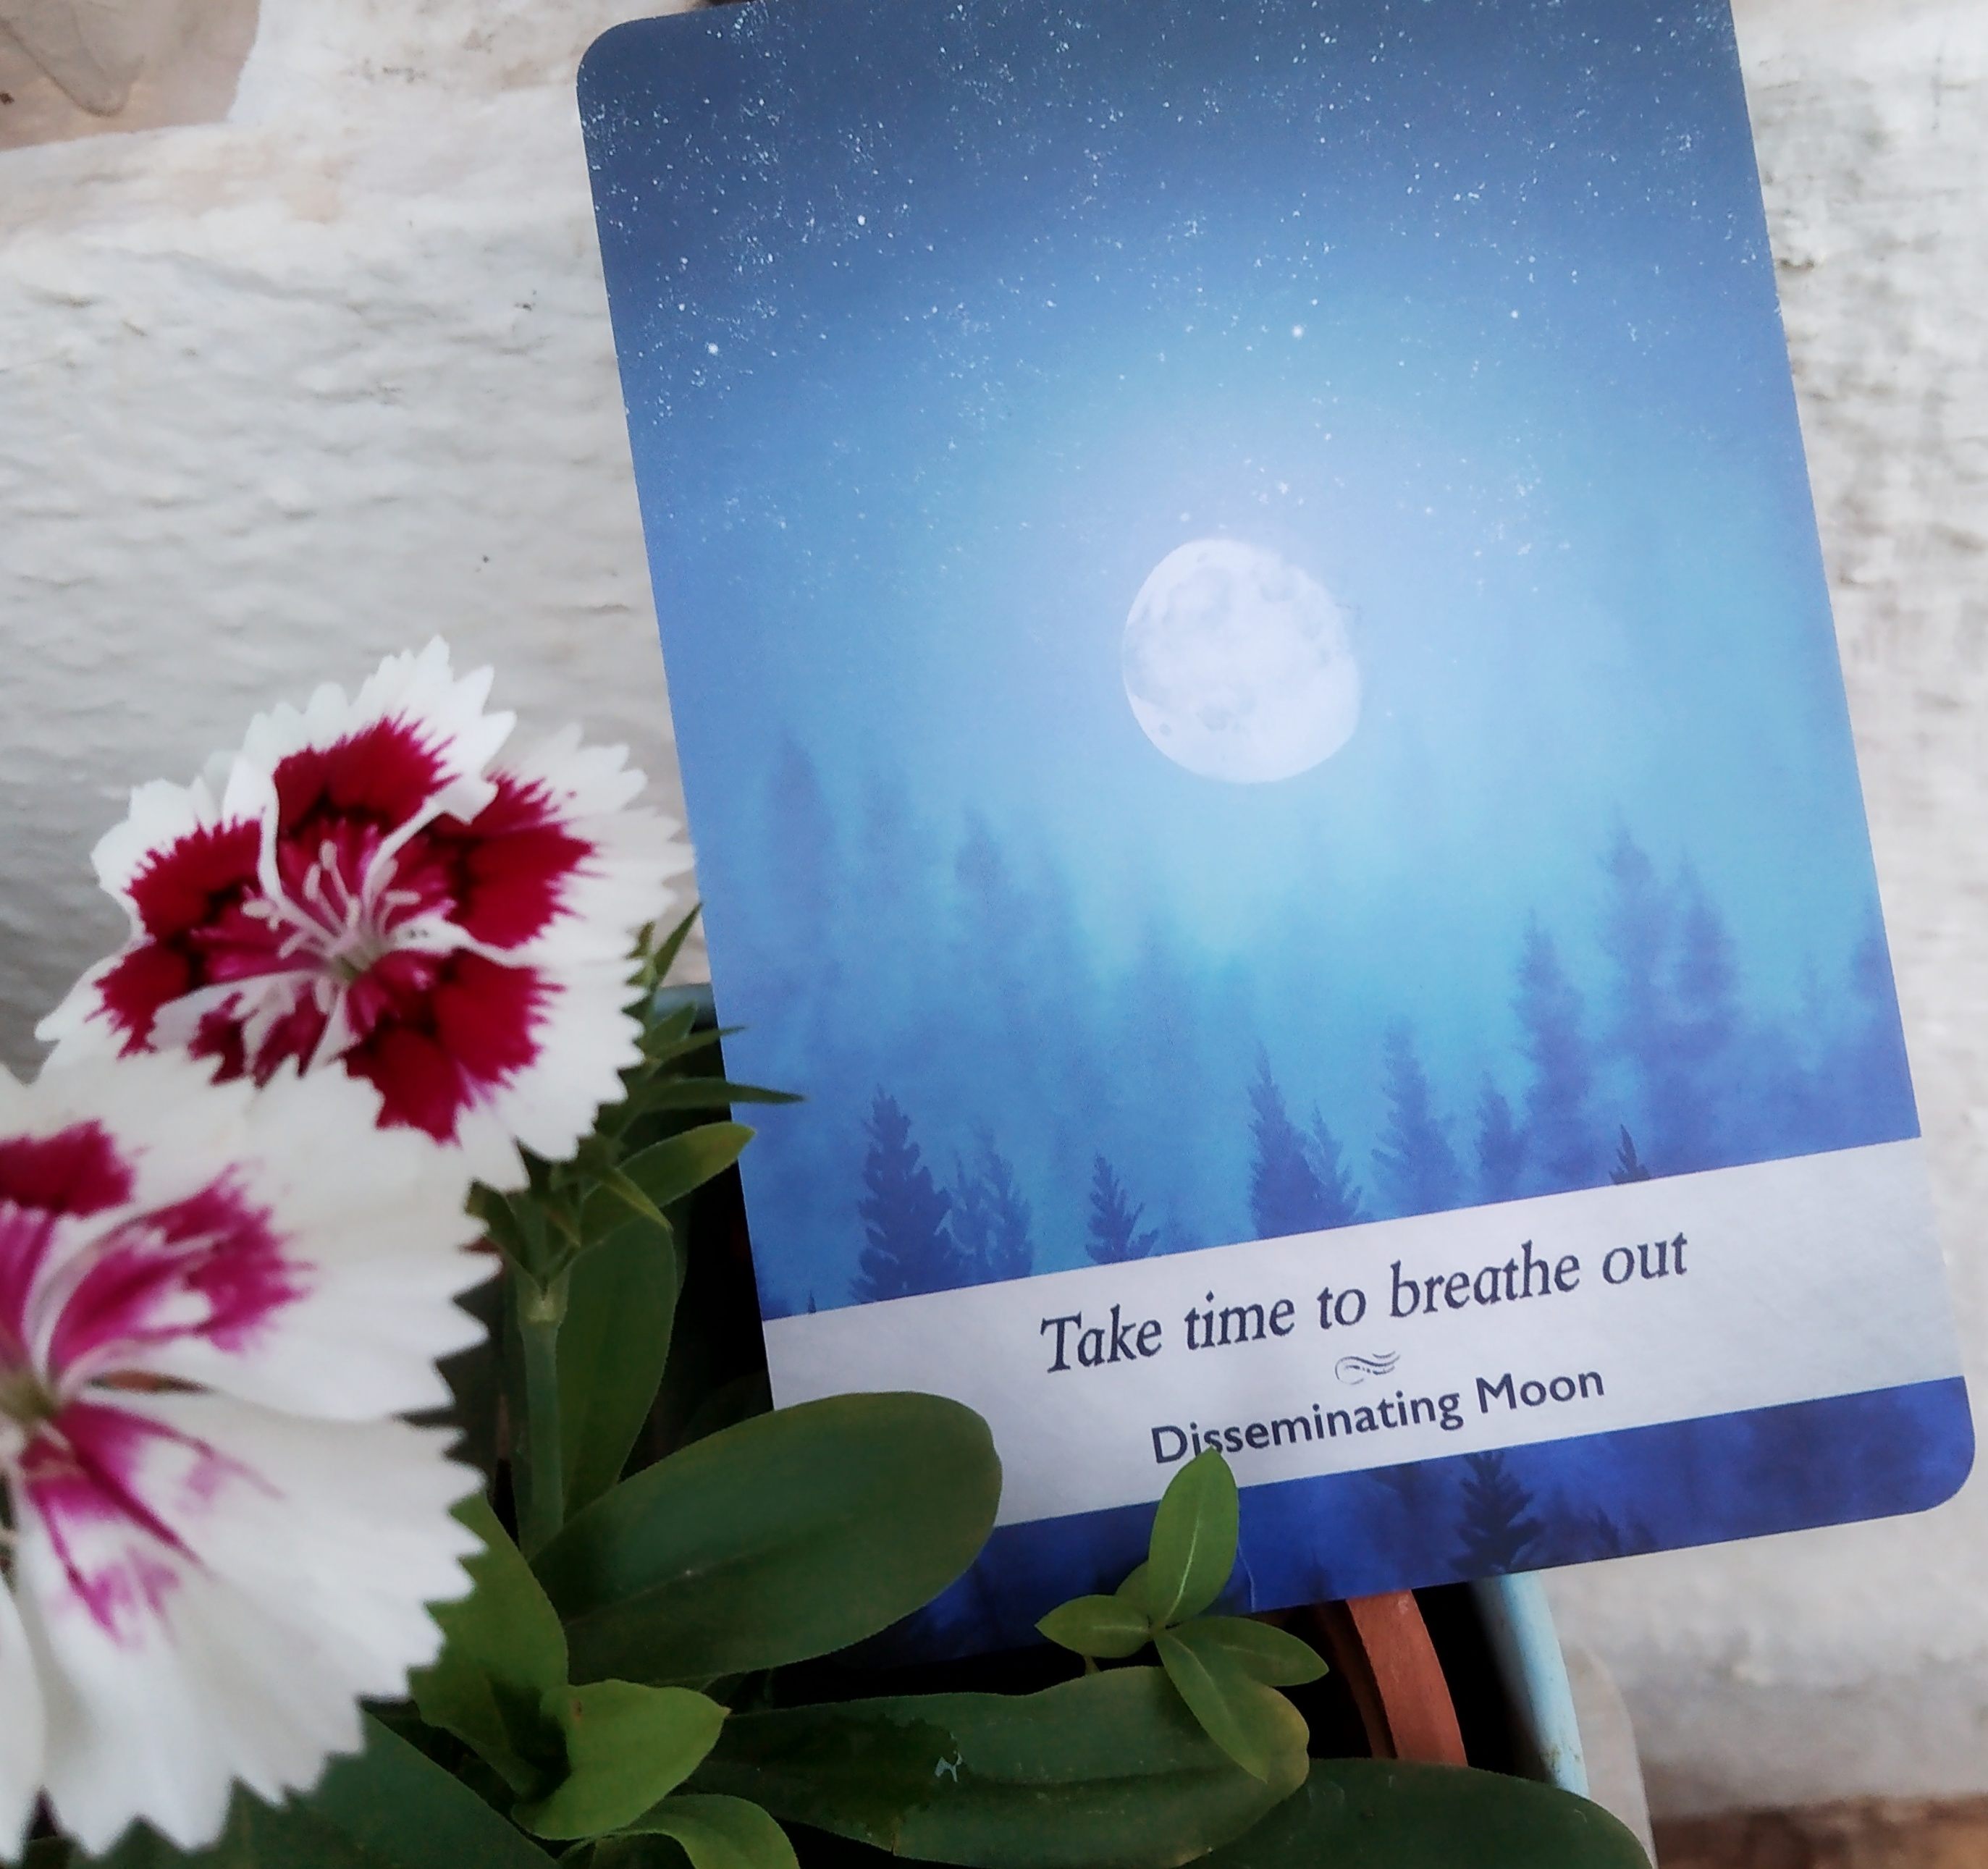 disseminating moon, moonology yasmin galoren, oracle card moon,